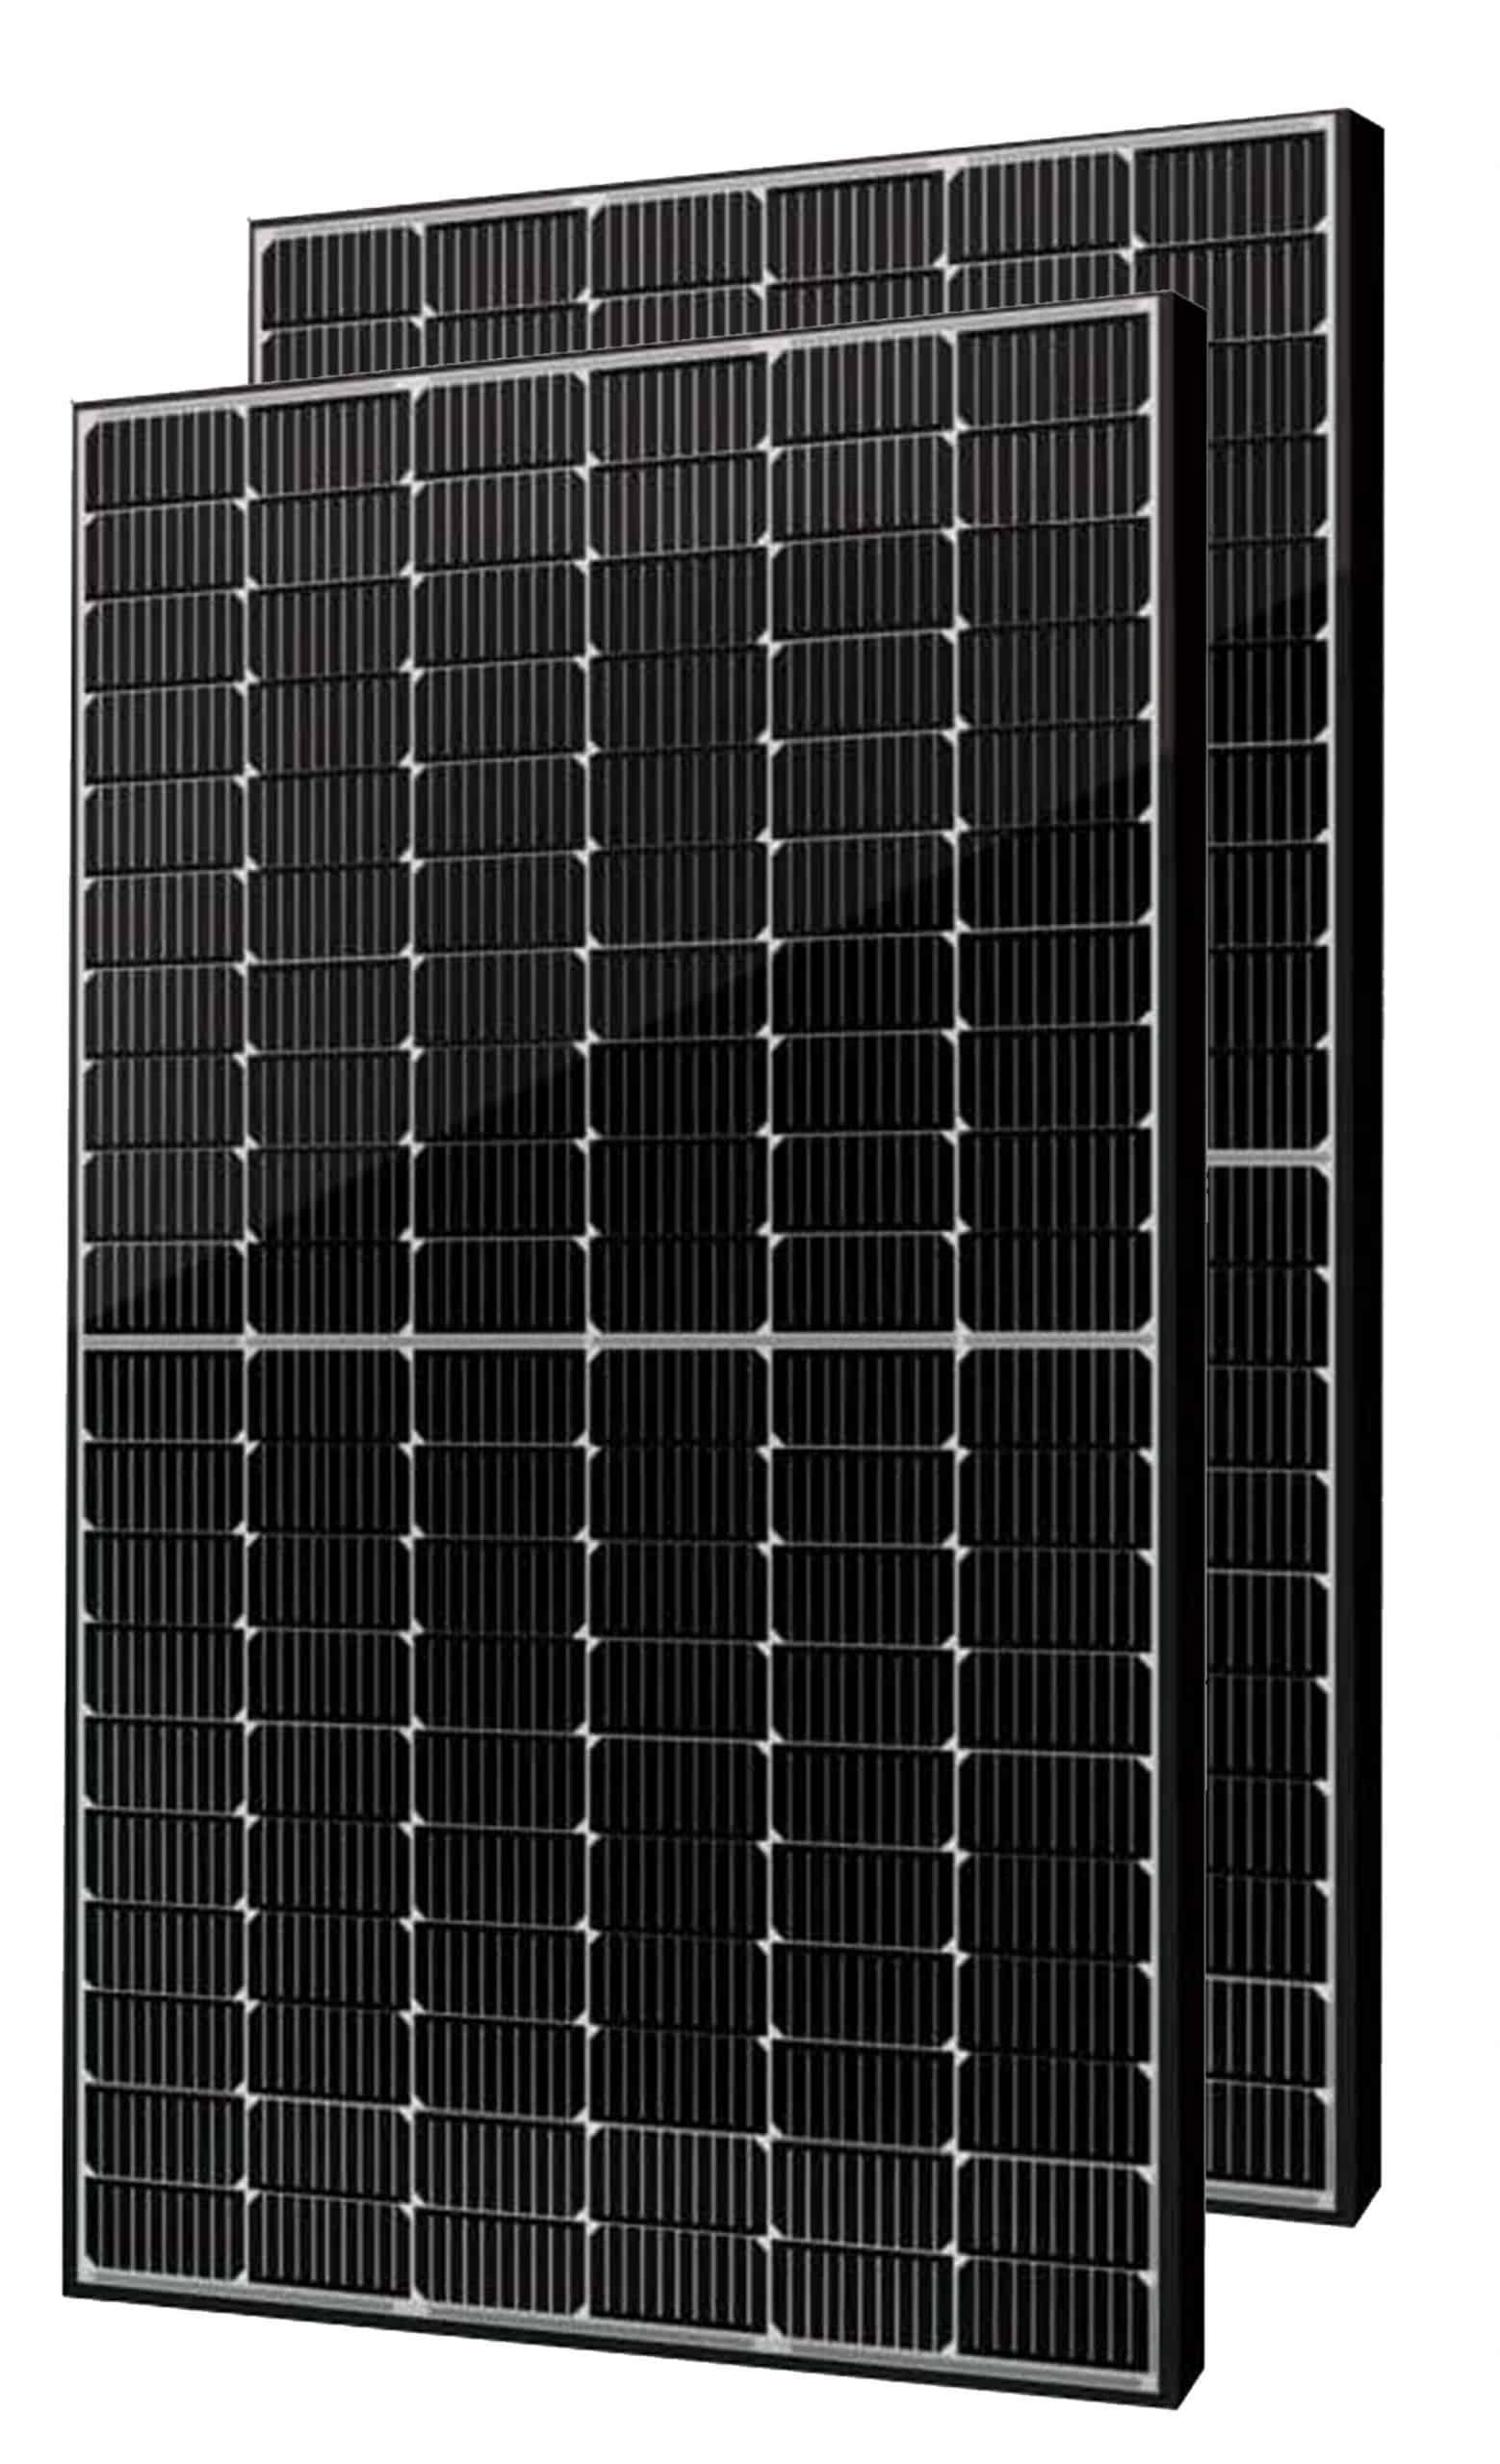 Two Seraphim 370w Solar Panels